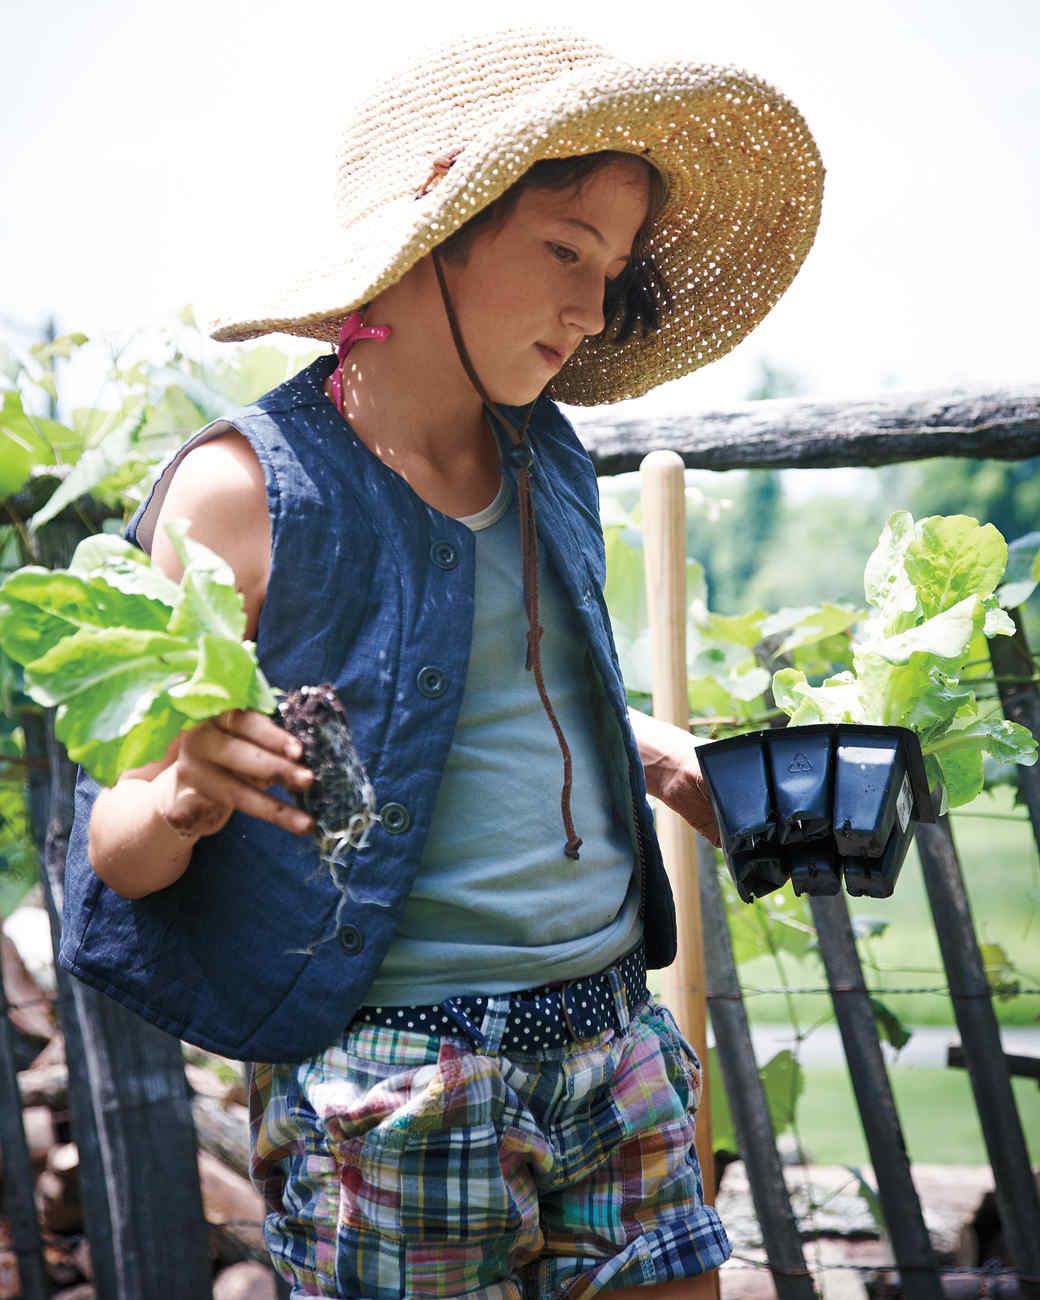 garden-party-lettuce-md107635.jpg